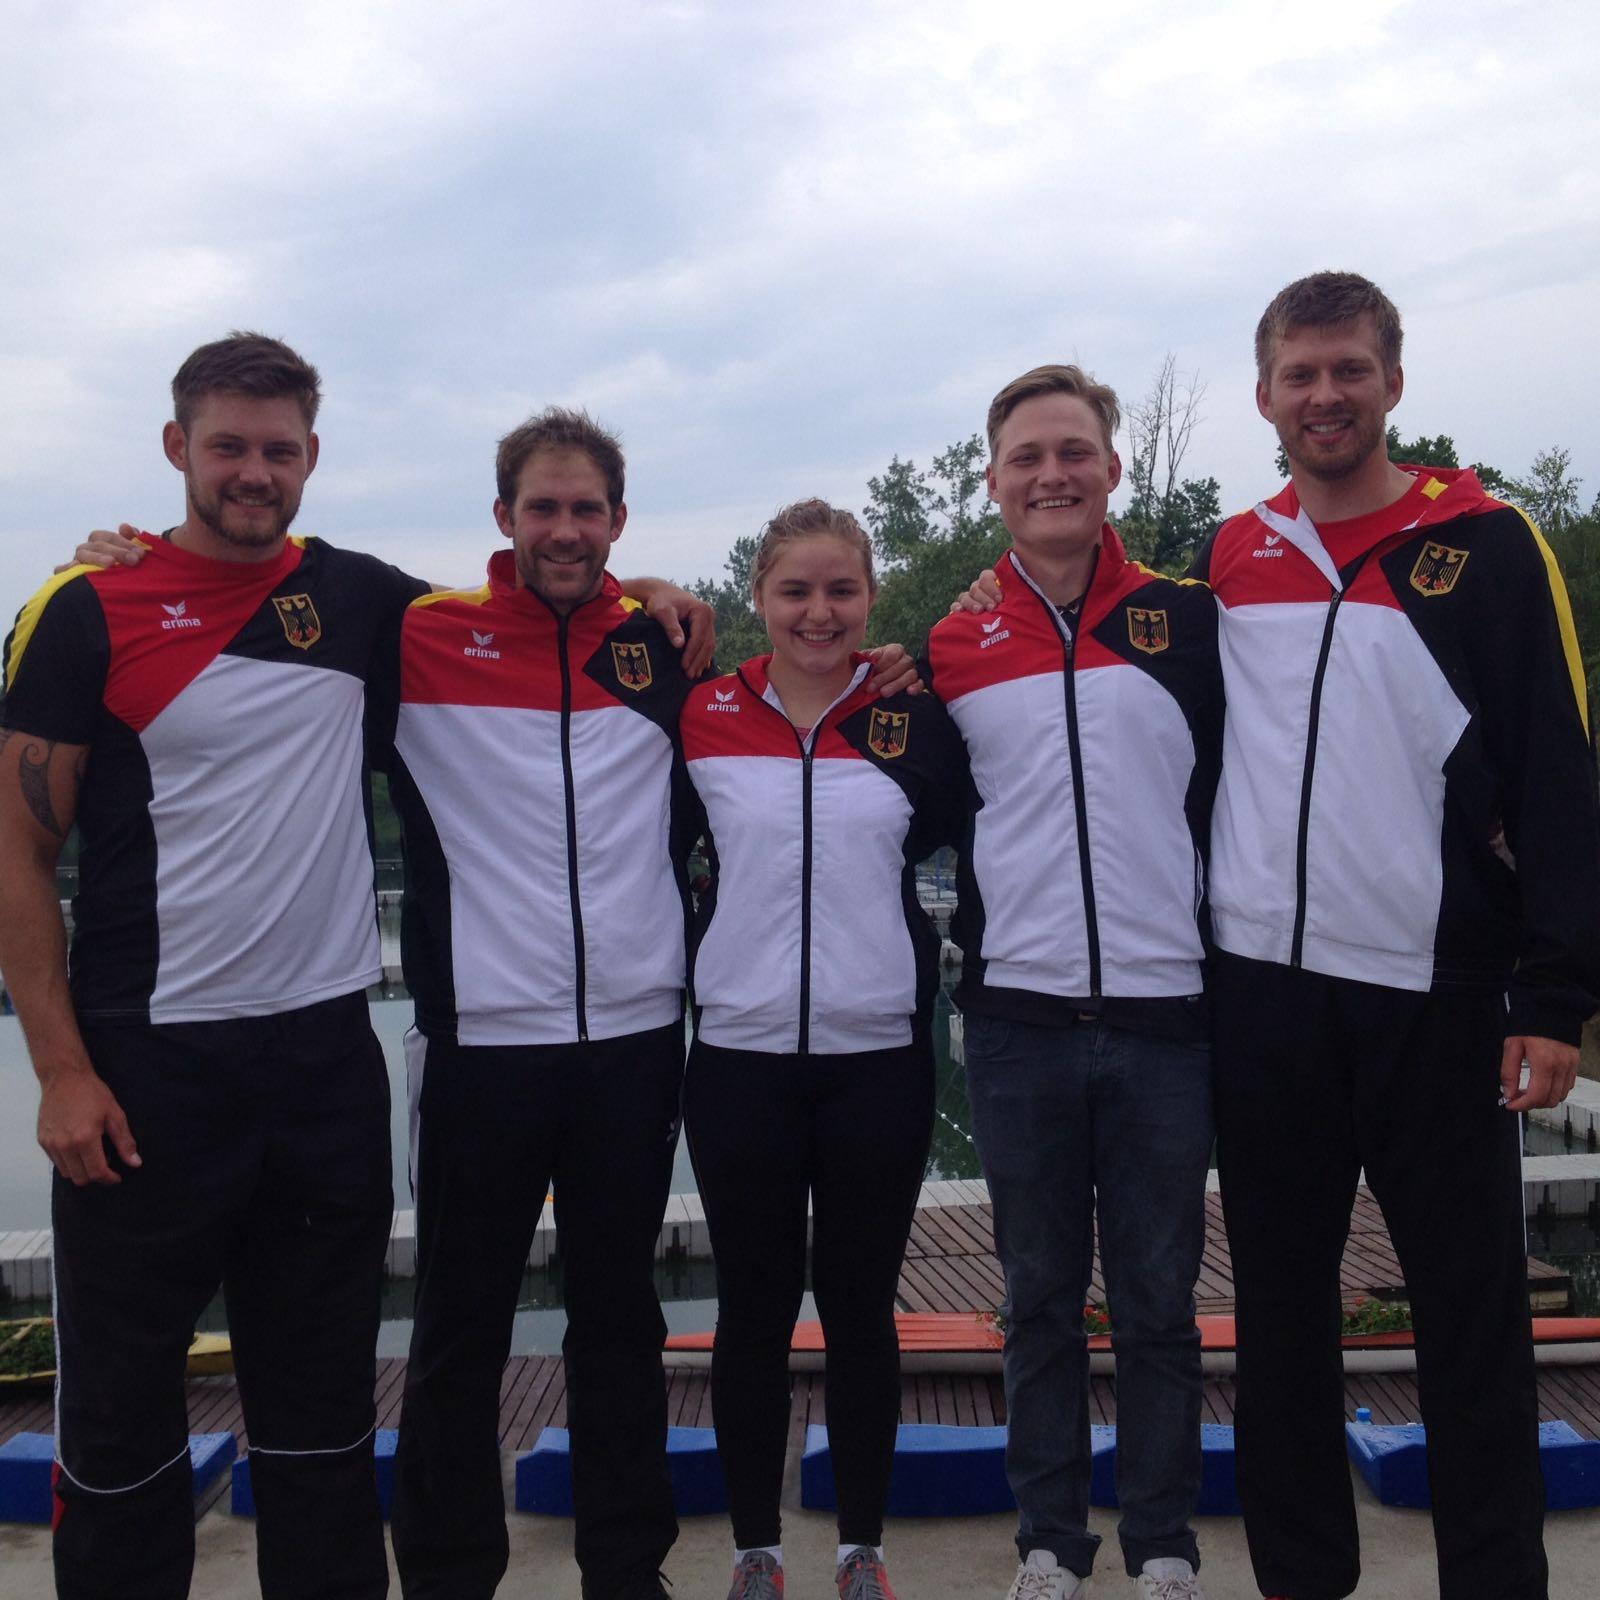 Deutsche Nationalmannschaften erlangen Spitzenplätze